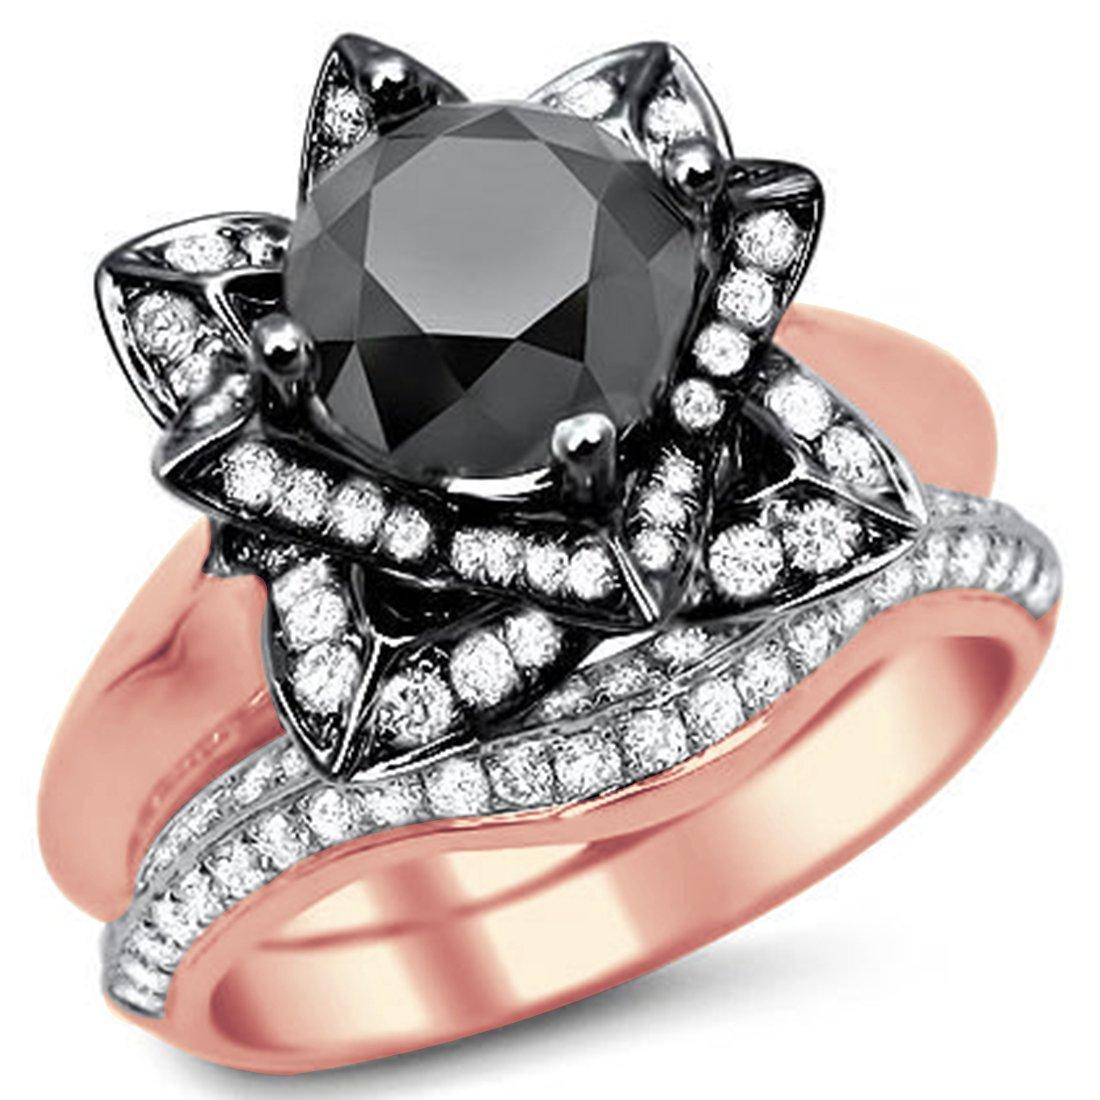 Smjewels 3.35 Ct Round Black Sim.Diamond Lotus Flower Engagement Ring Set In 14K Rose Gold Fn